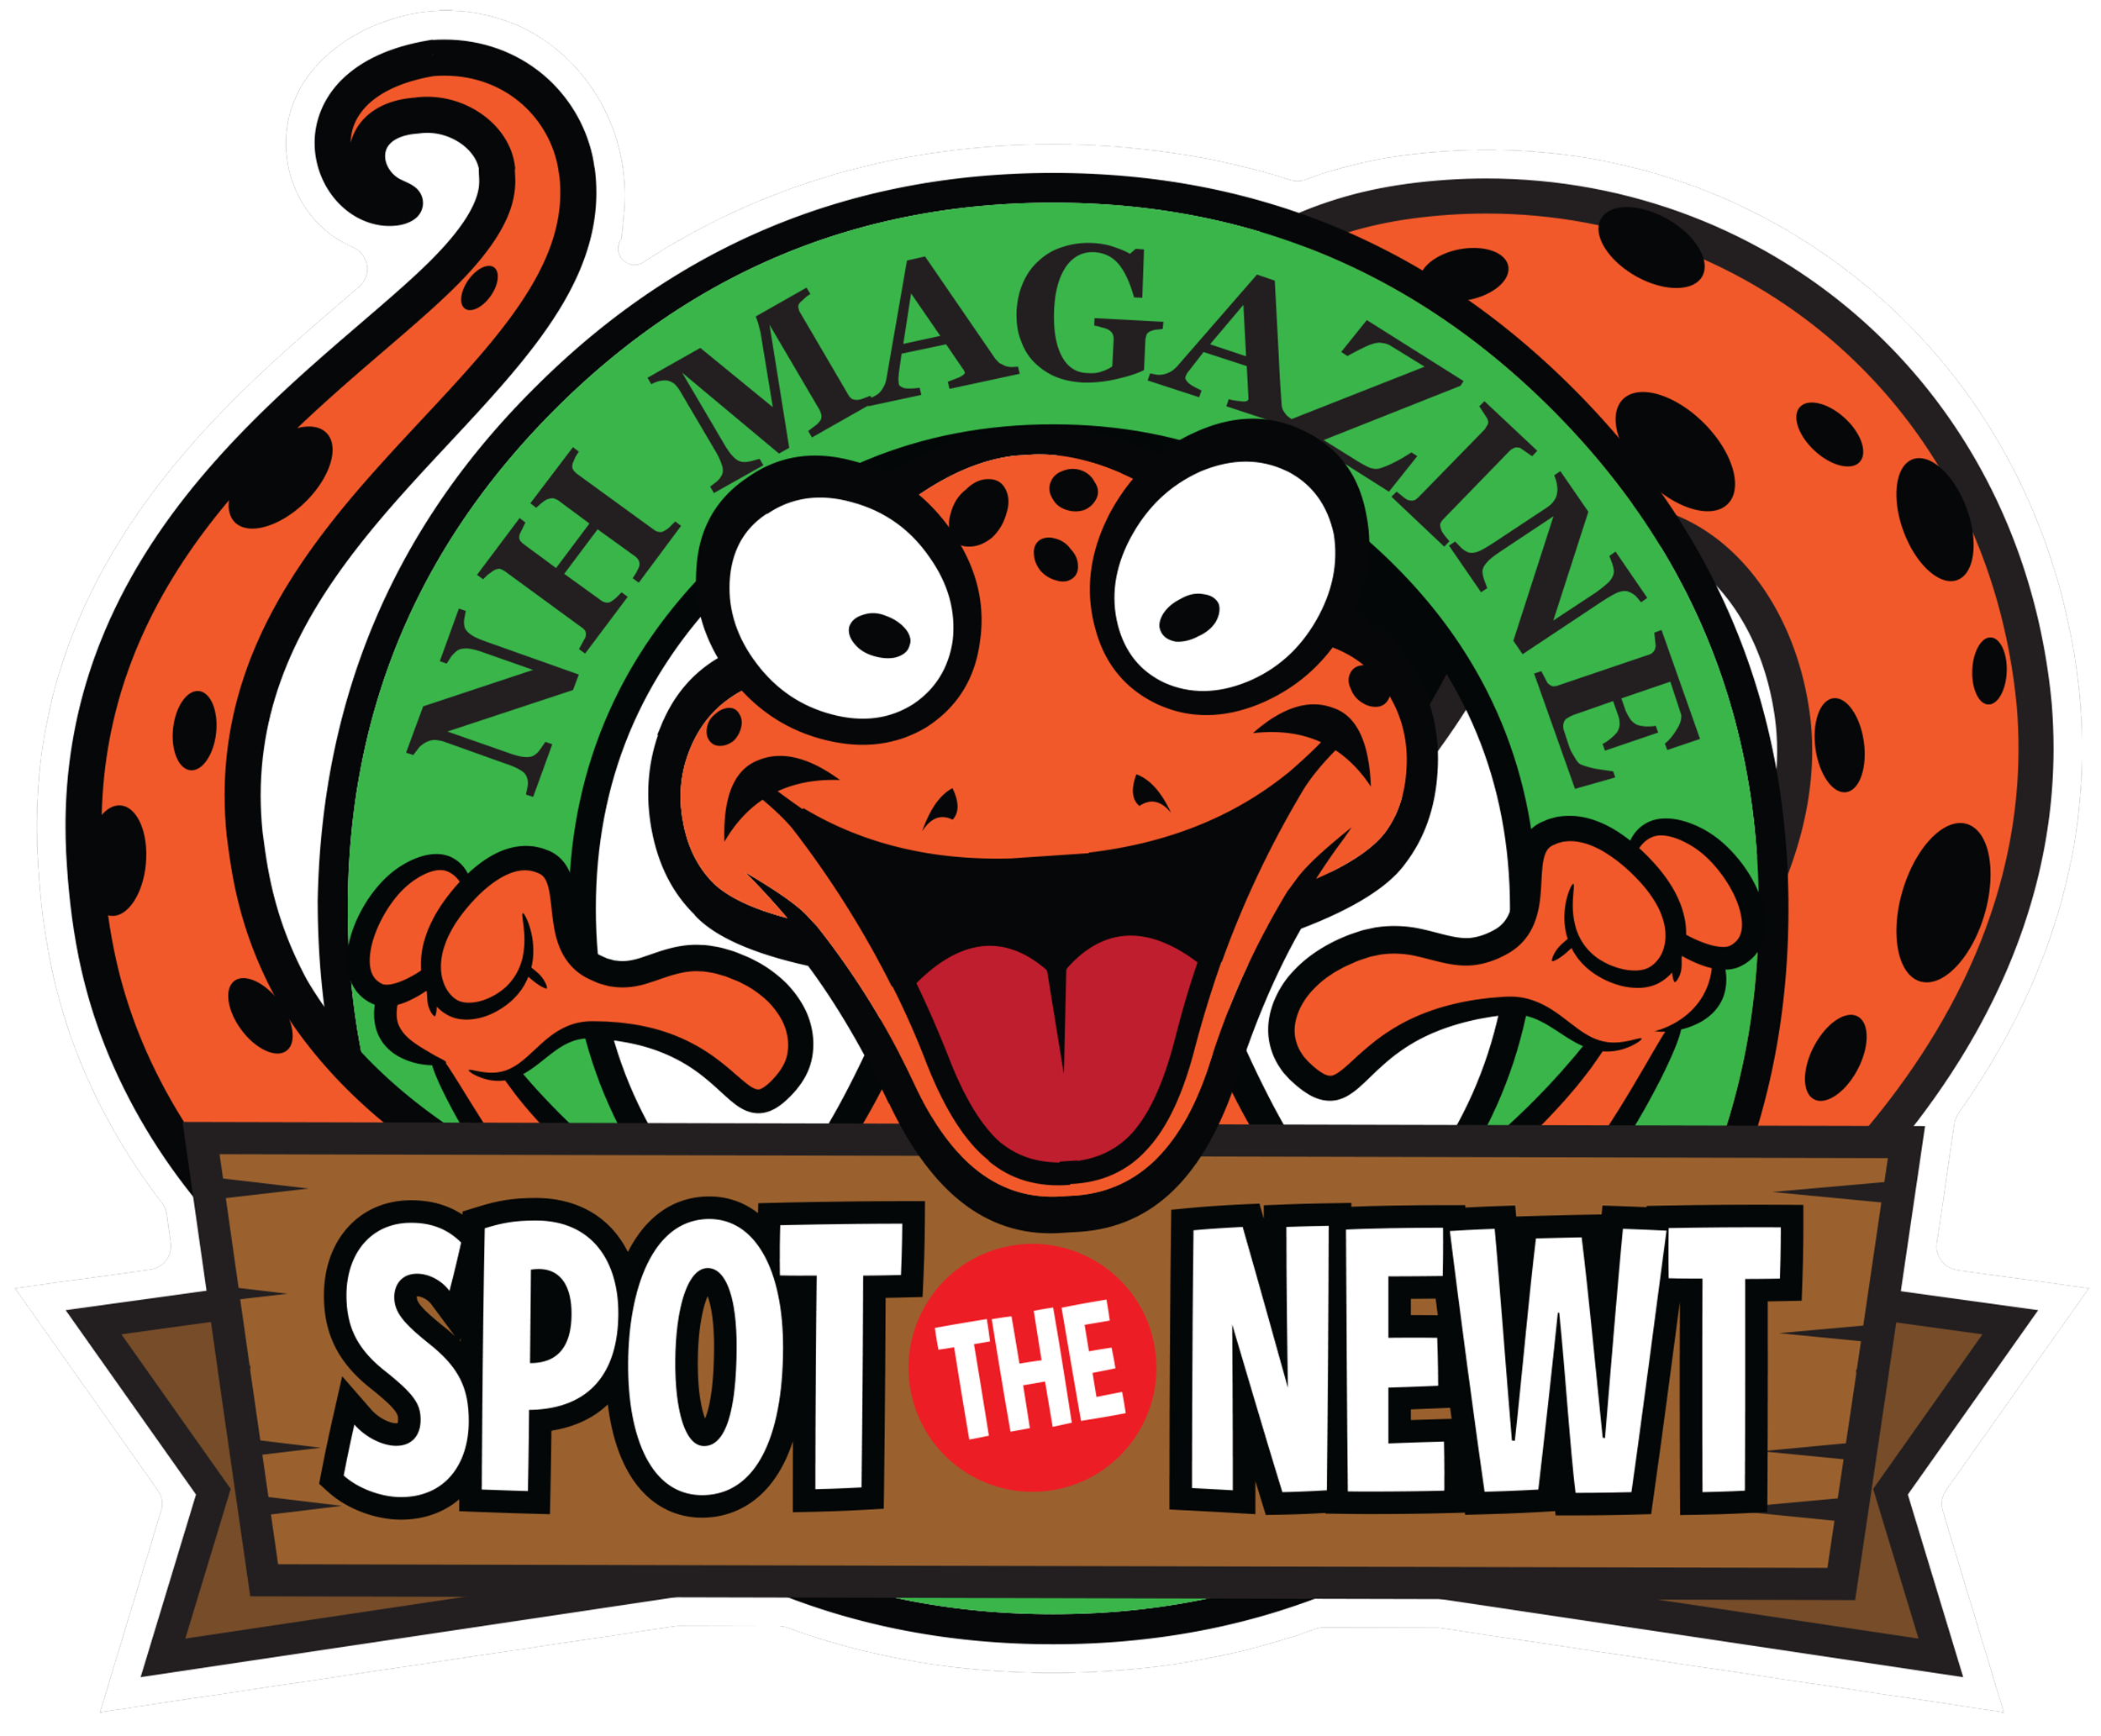 Spotthenewt